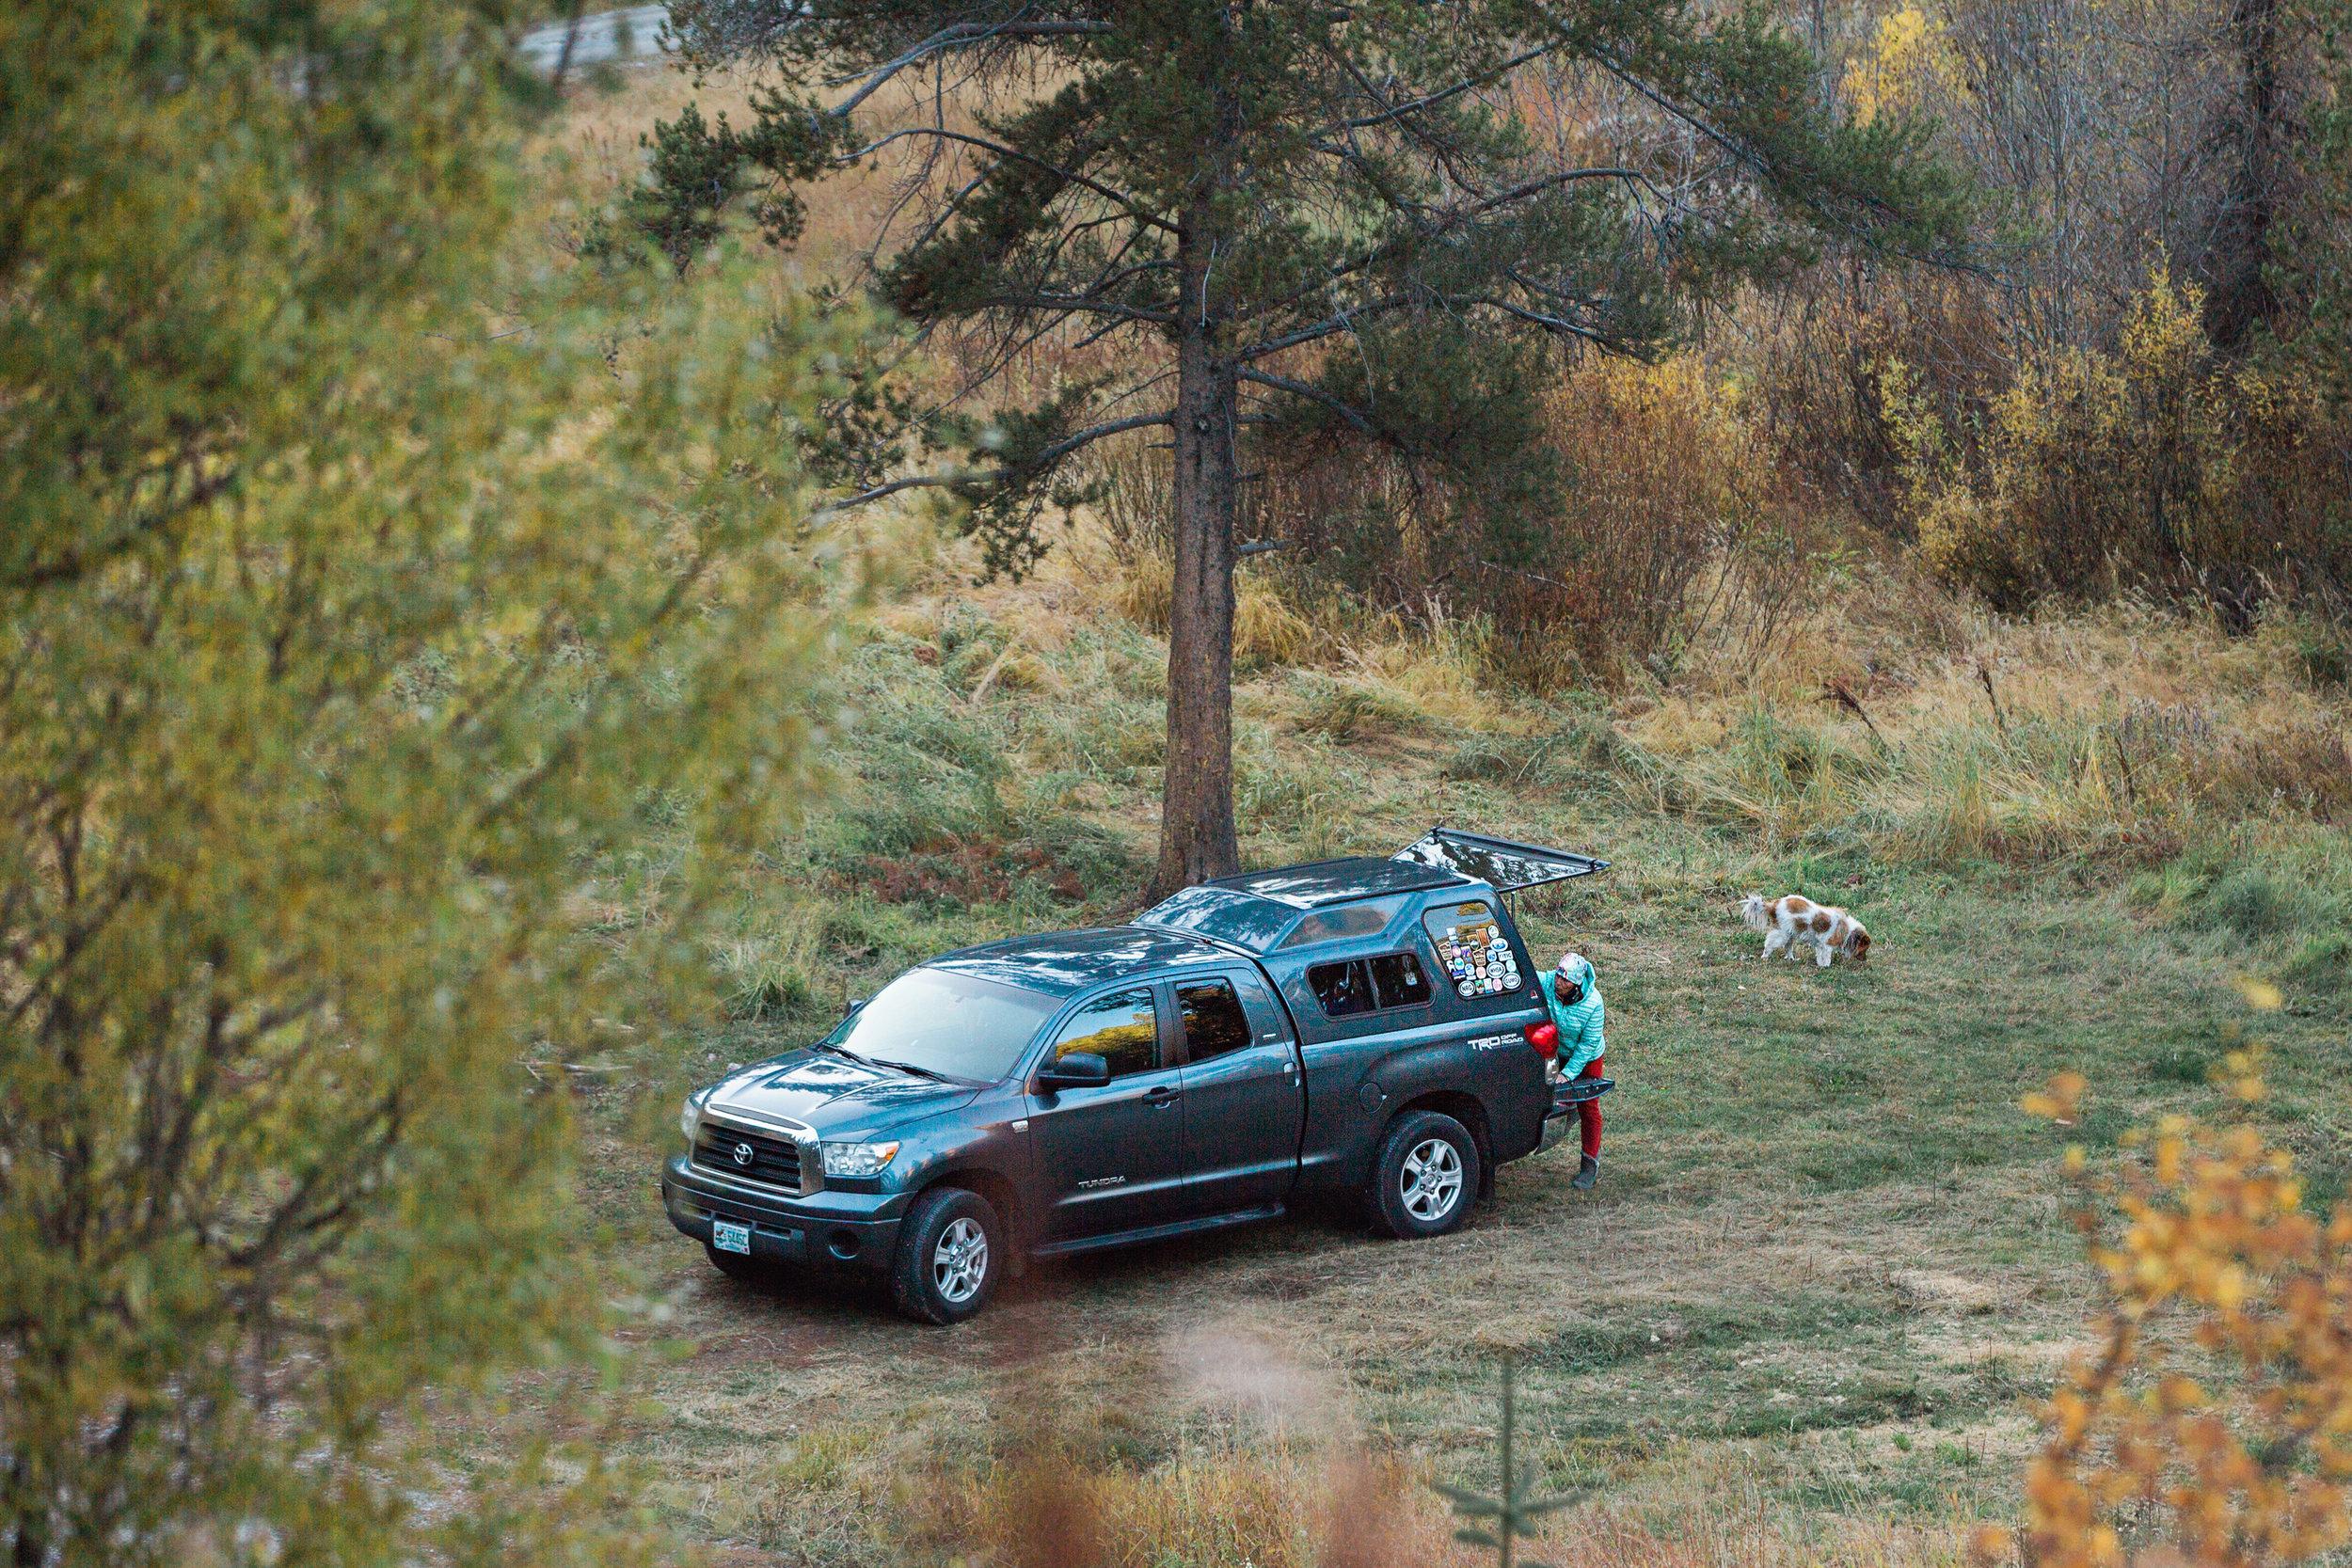 Cindy_Giovagnoli_Idaho_Wyoming_Grand_Teton_National_Park_autumn_aspens_camping_mountains-023.jpg